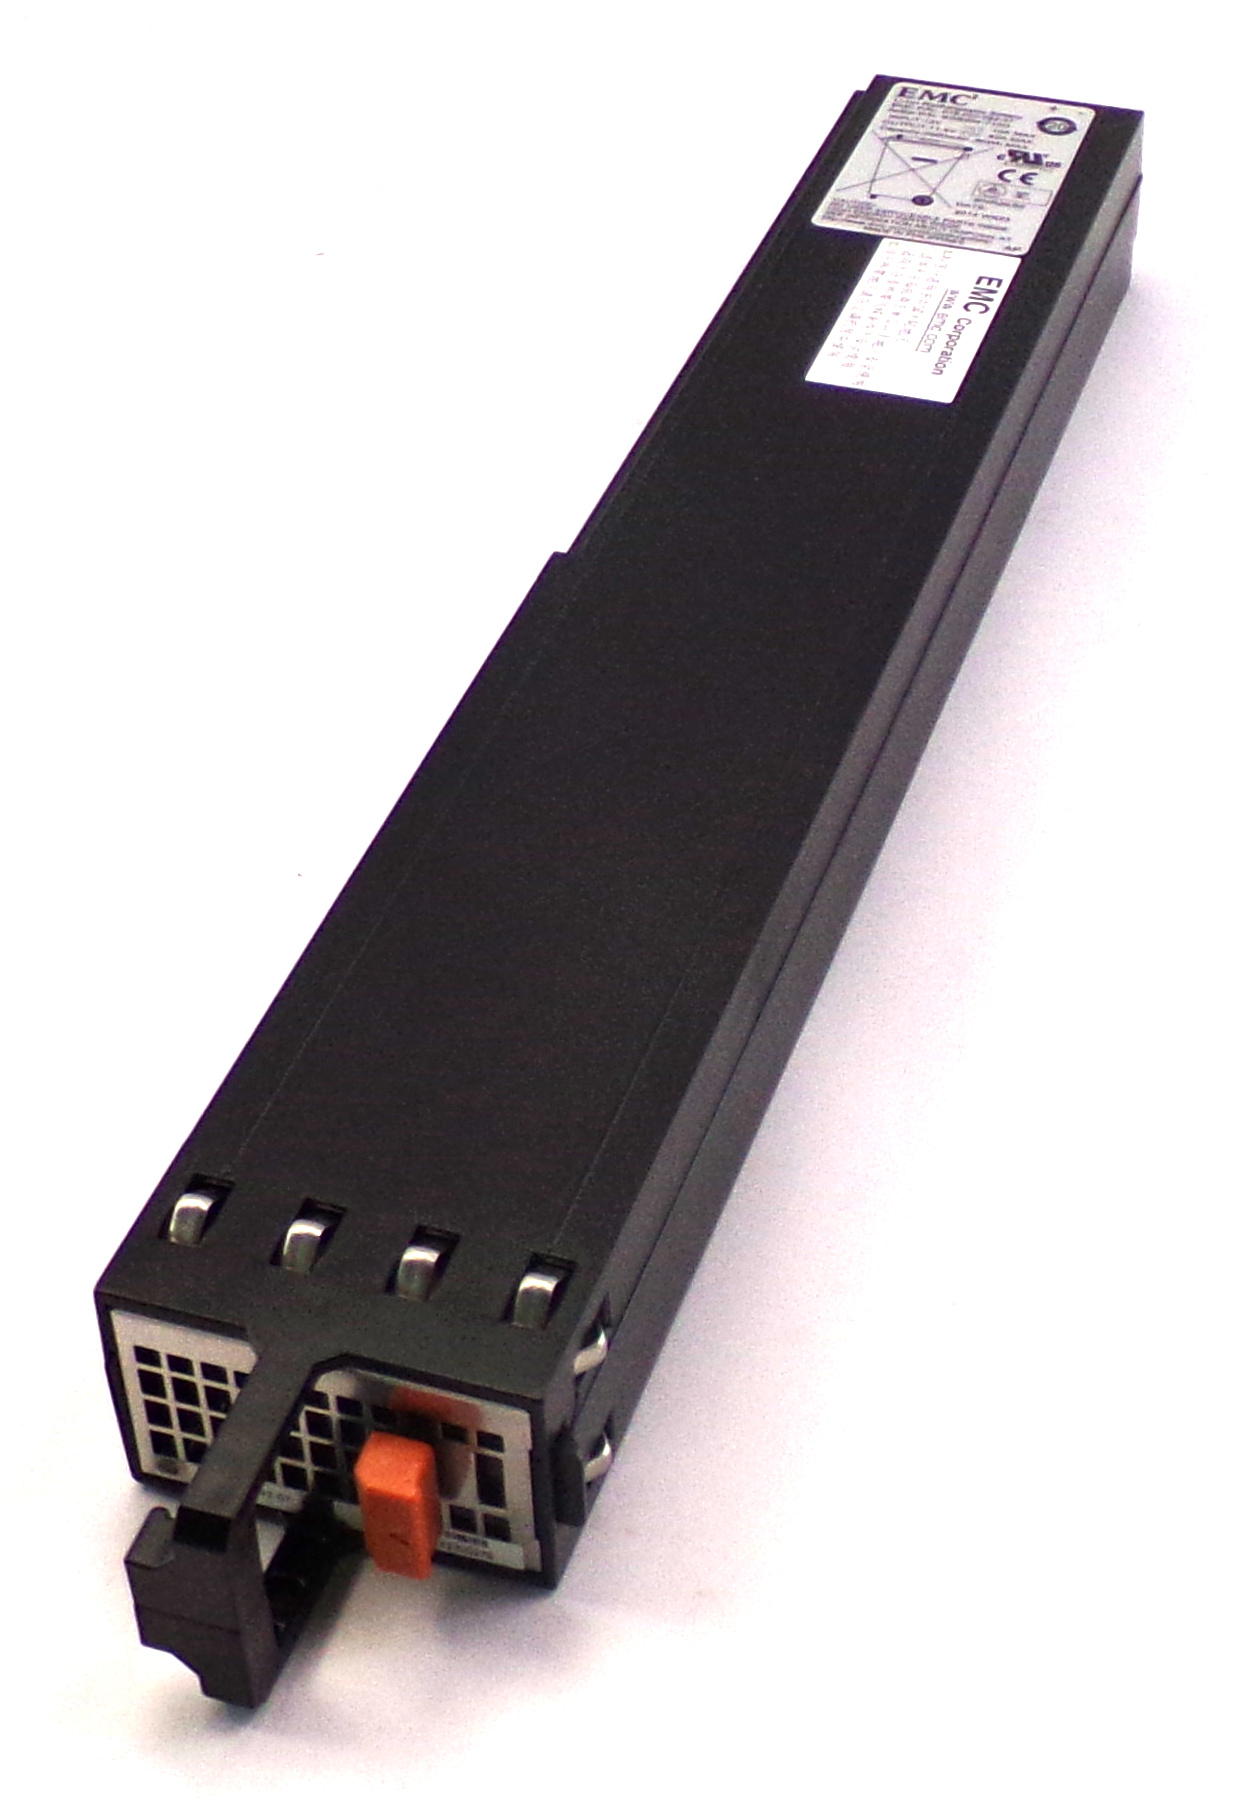 EMC 078-000-092-07 AcBel SGB004-710G Li-ion Rechargeable Battery